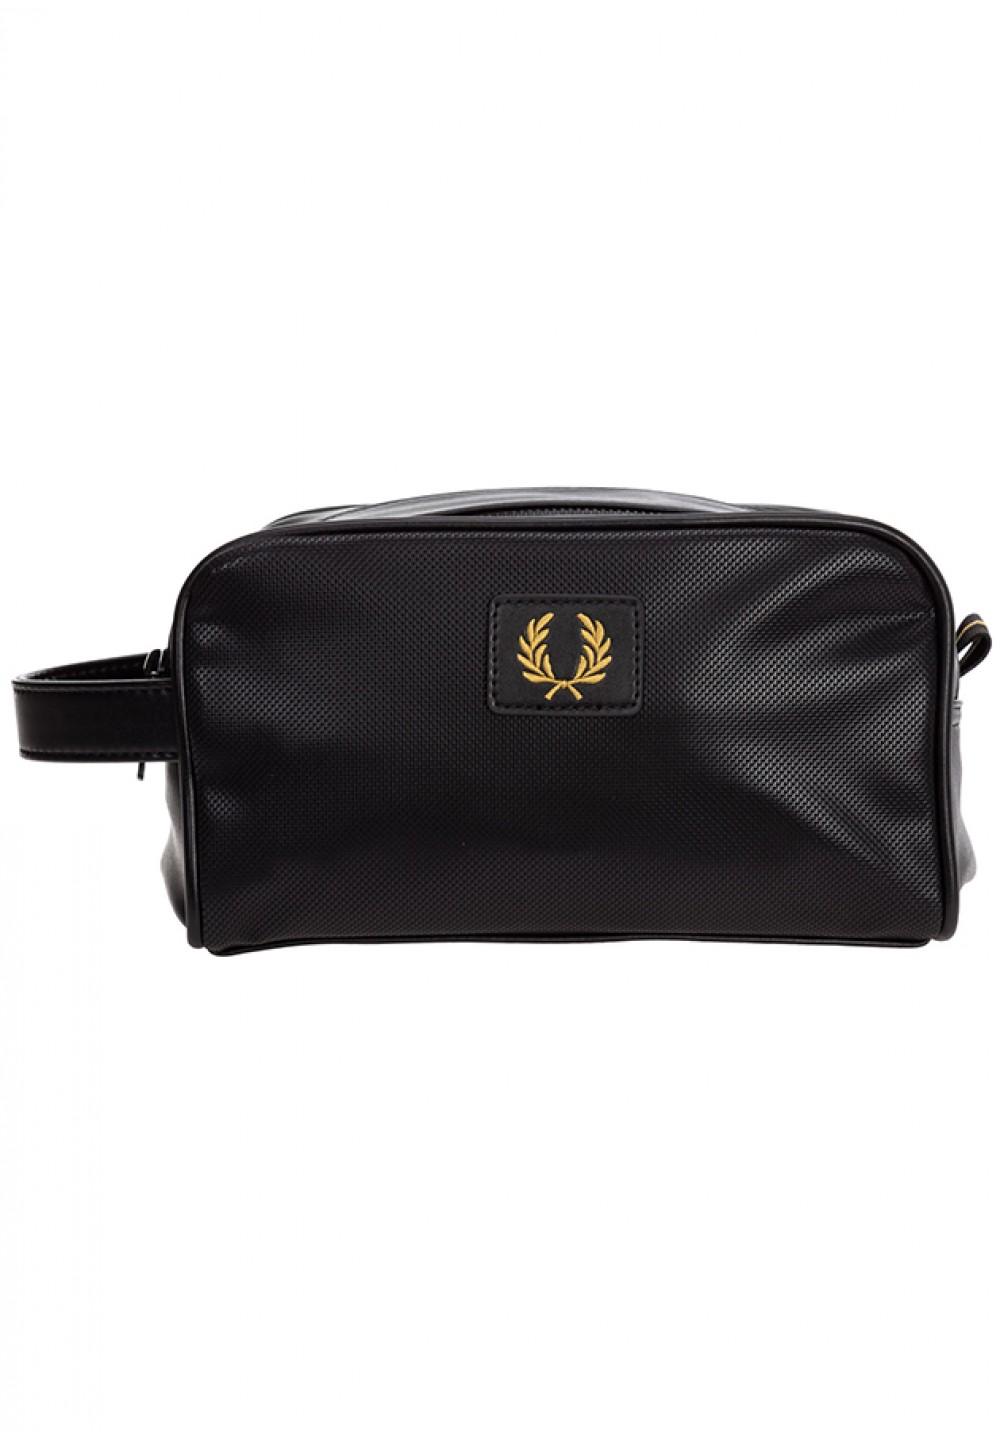 Маленька чорна сумочка з логотипом